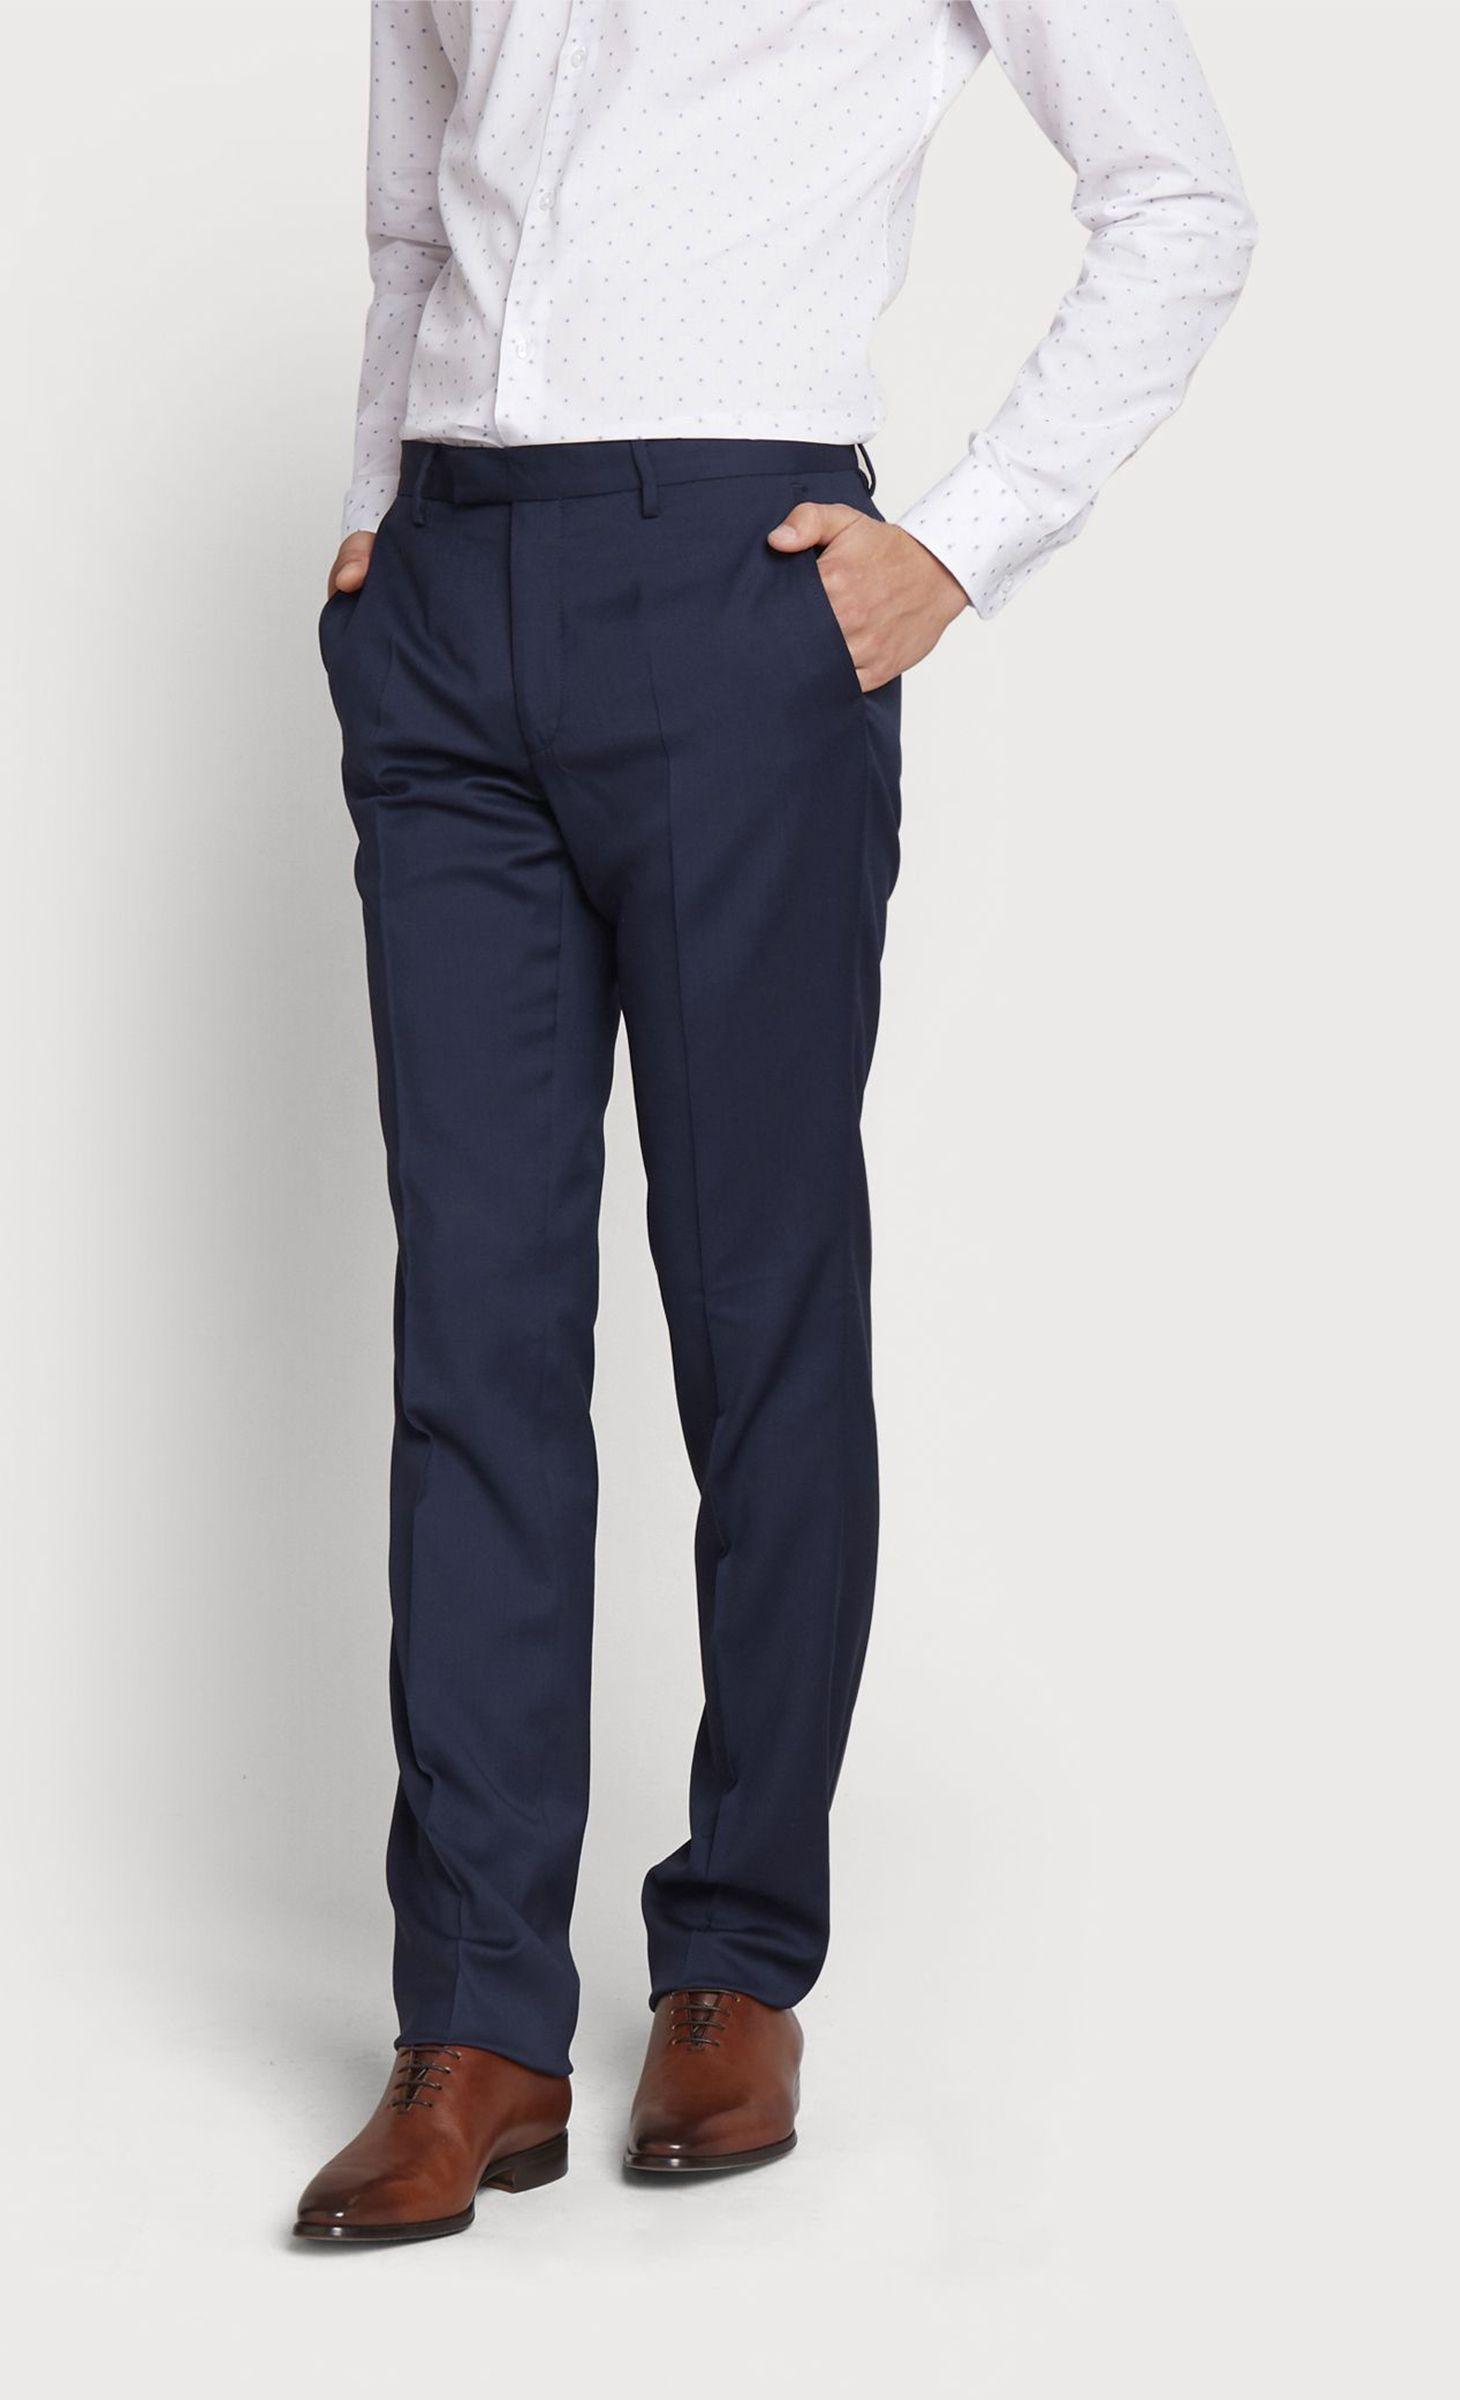 Ville Slim Pantalon Saphir Fit Bleu PXZuTiwOkl